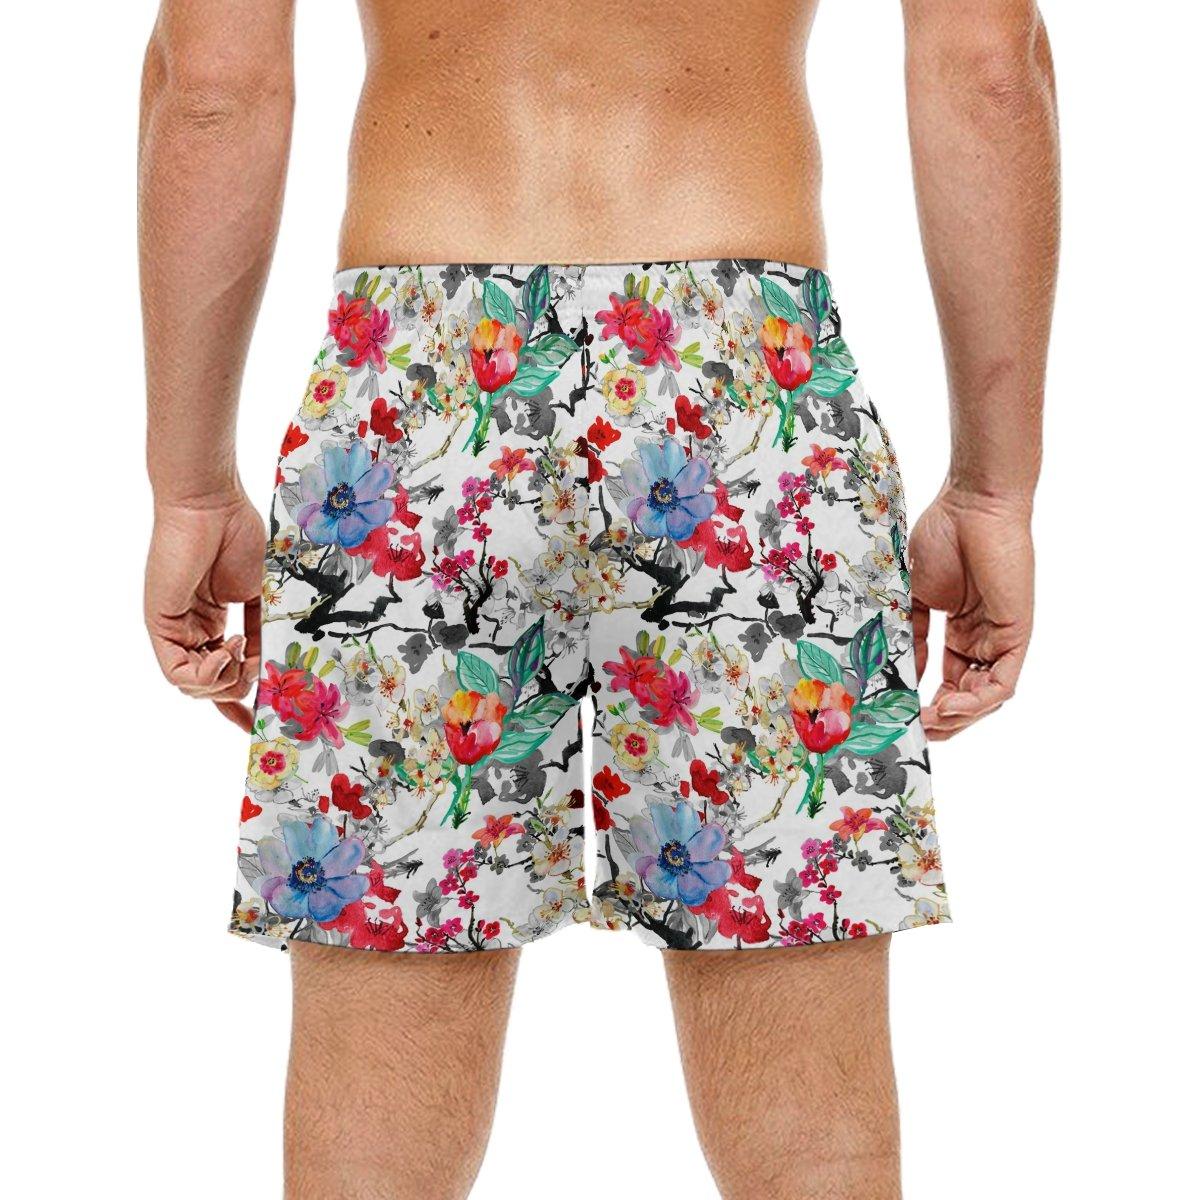 LORVIES Mens Pulm Flowers Beach Board Shorts Quick Dry Swim Trunk